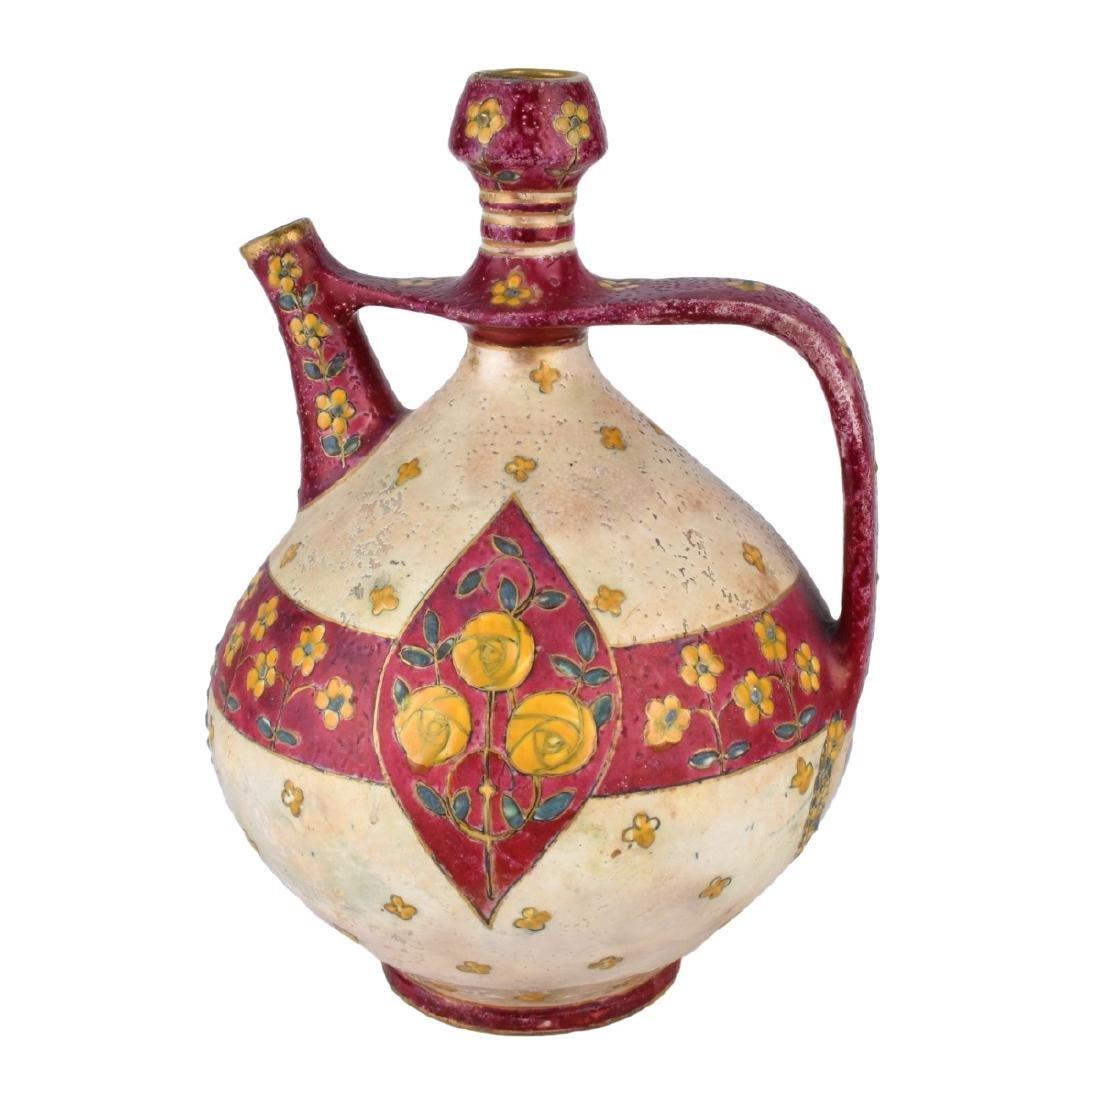 Large Amphora Enameled Pottery Pitcher